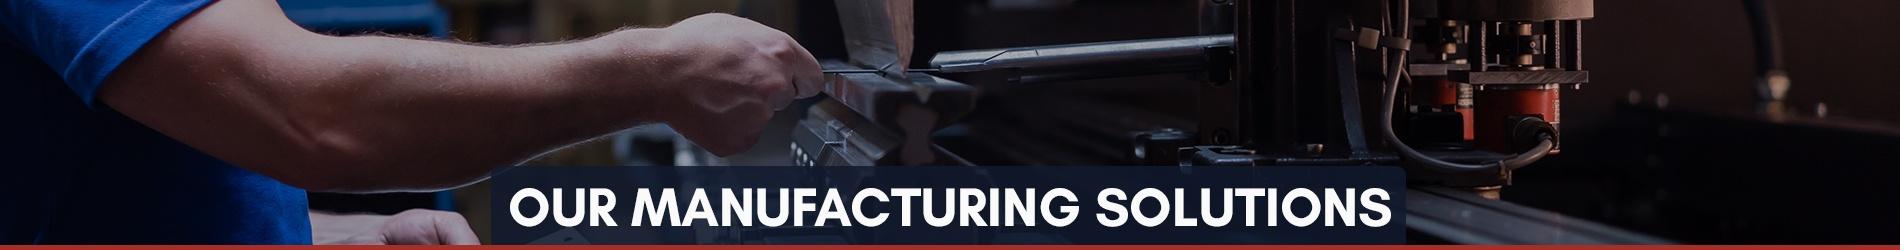 BSP_Industry_Solutions_Manufacturing_Header.jpg